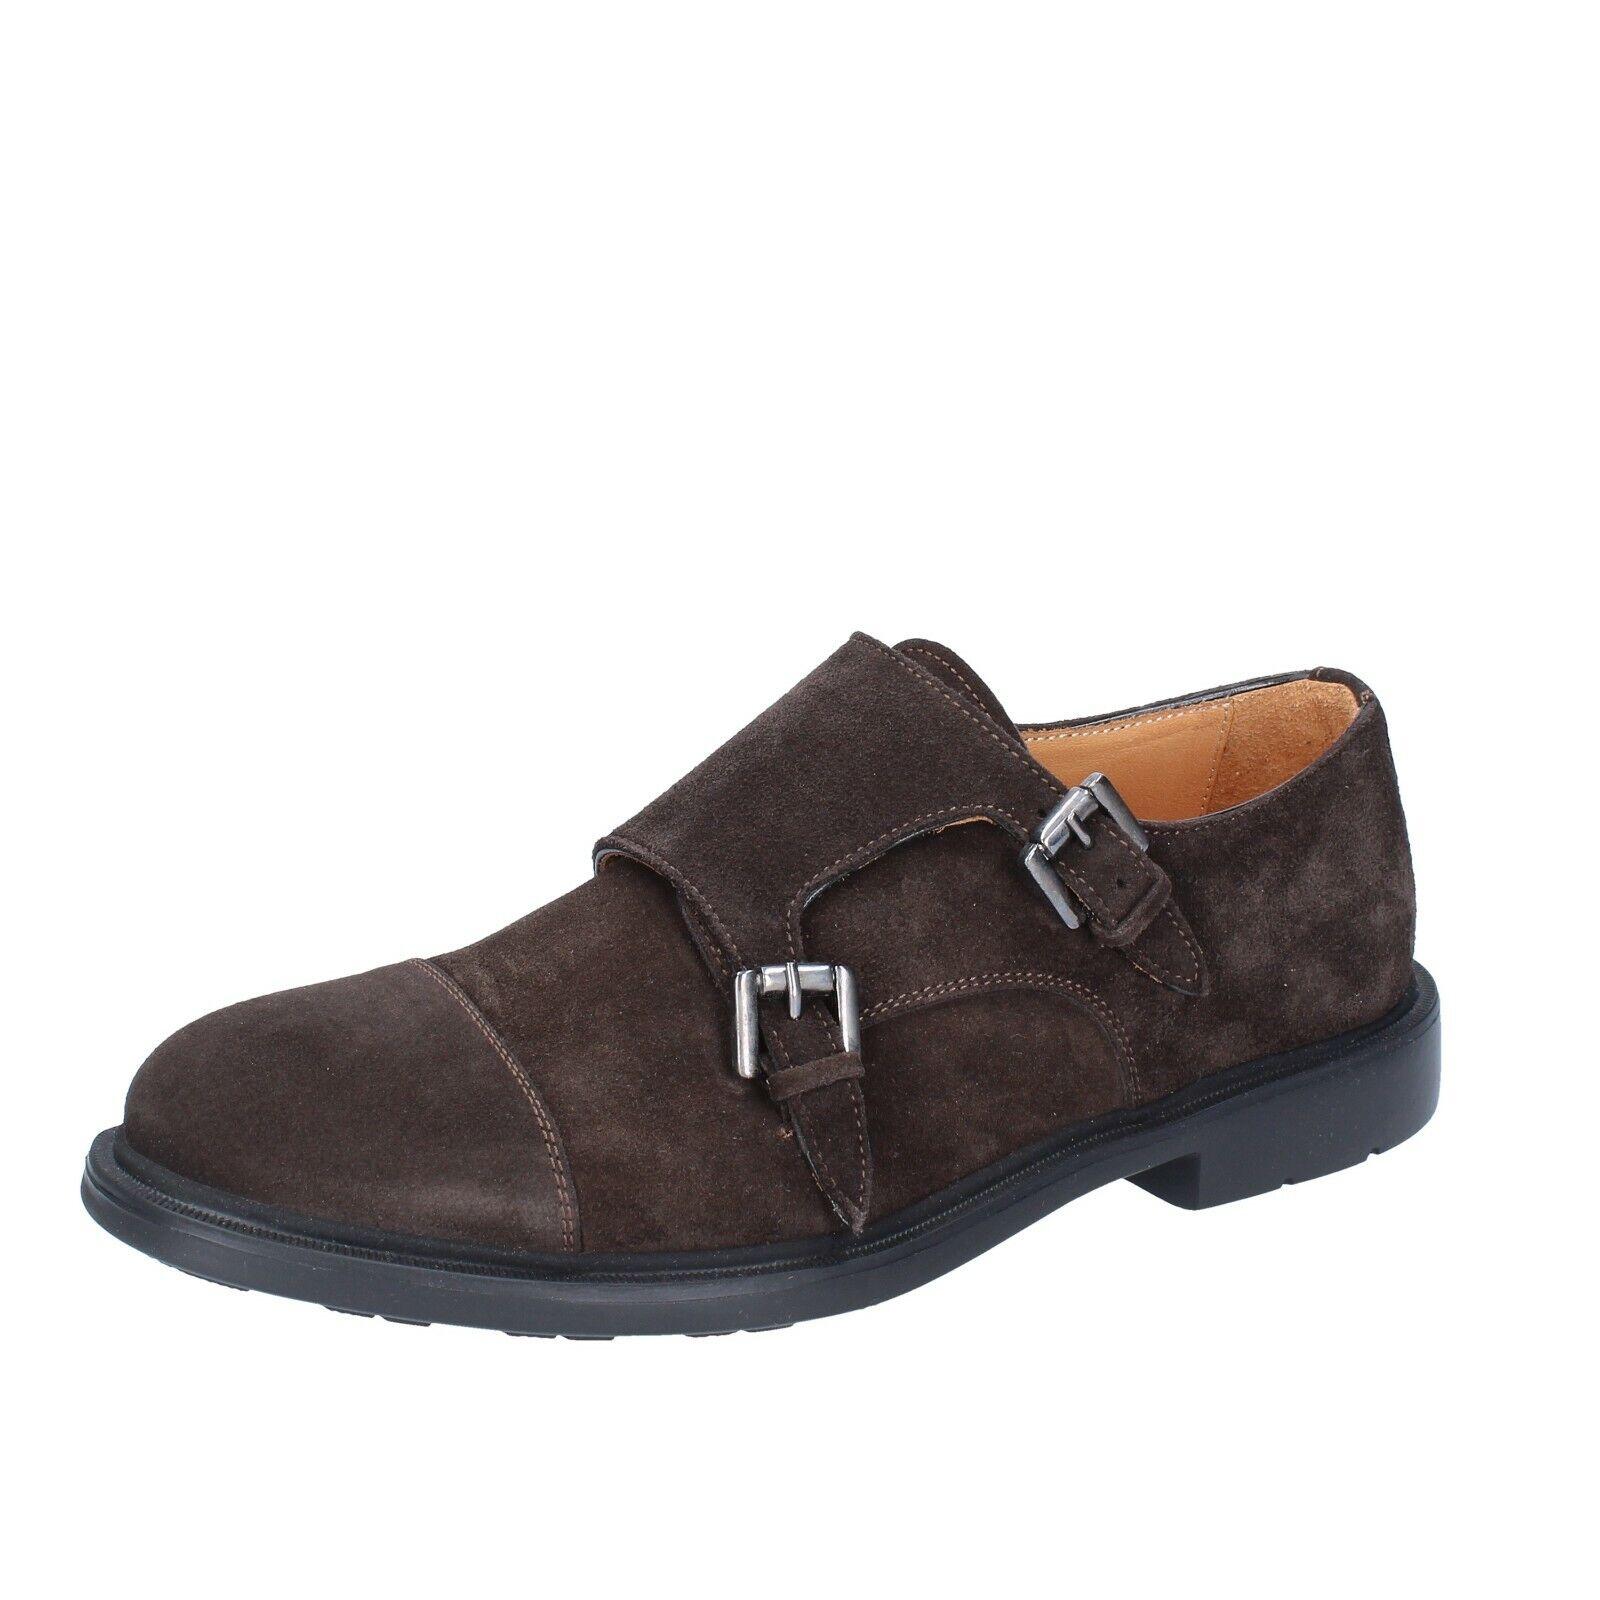 Mens shoes ZENITH 10 () elegant brown suede BS616-44